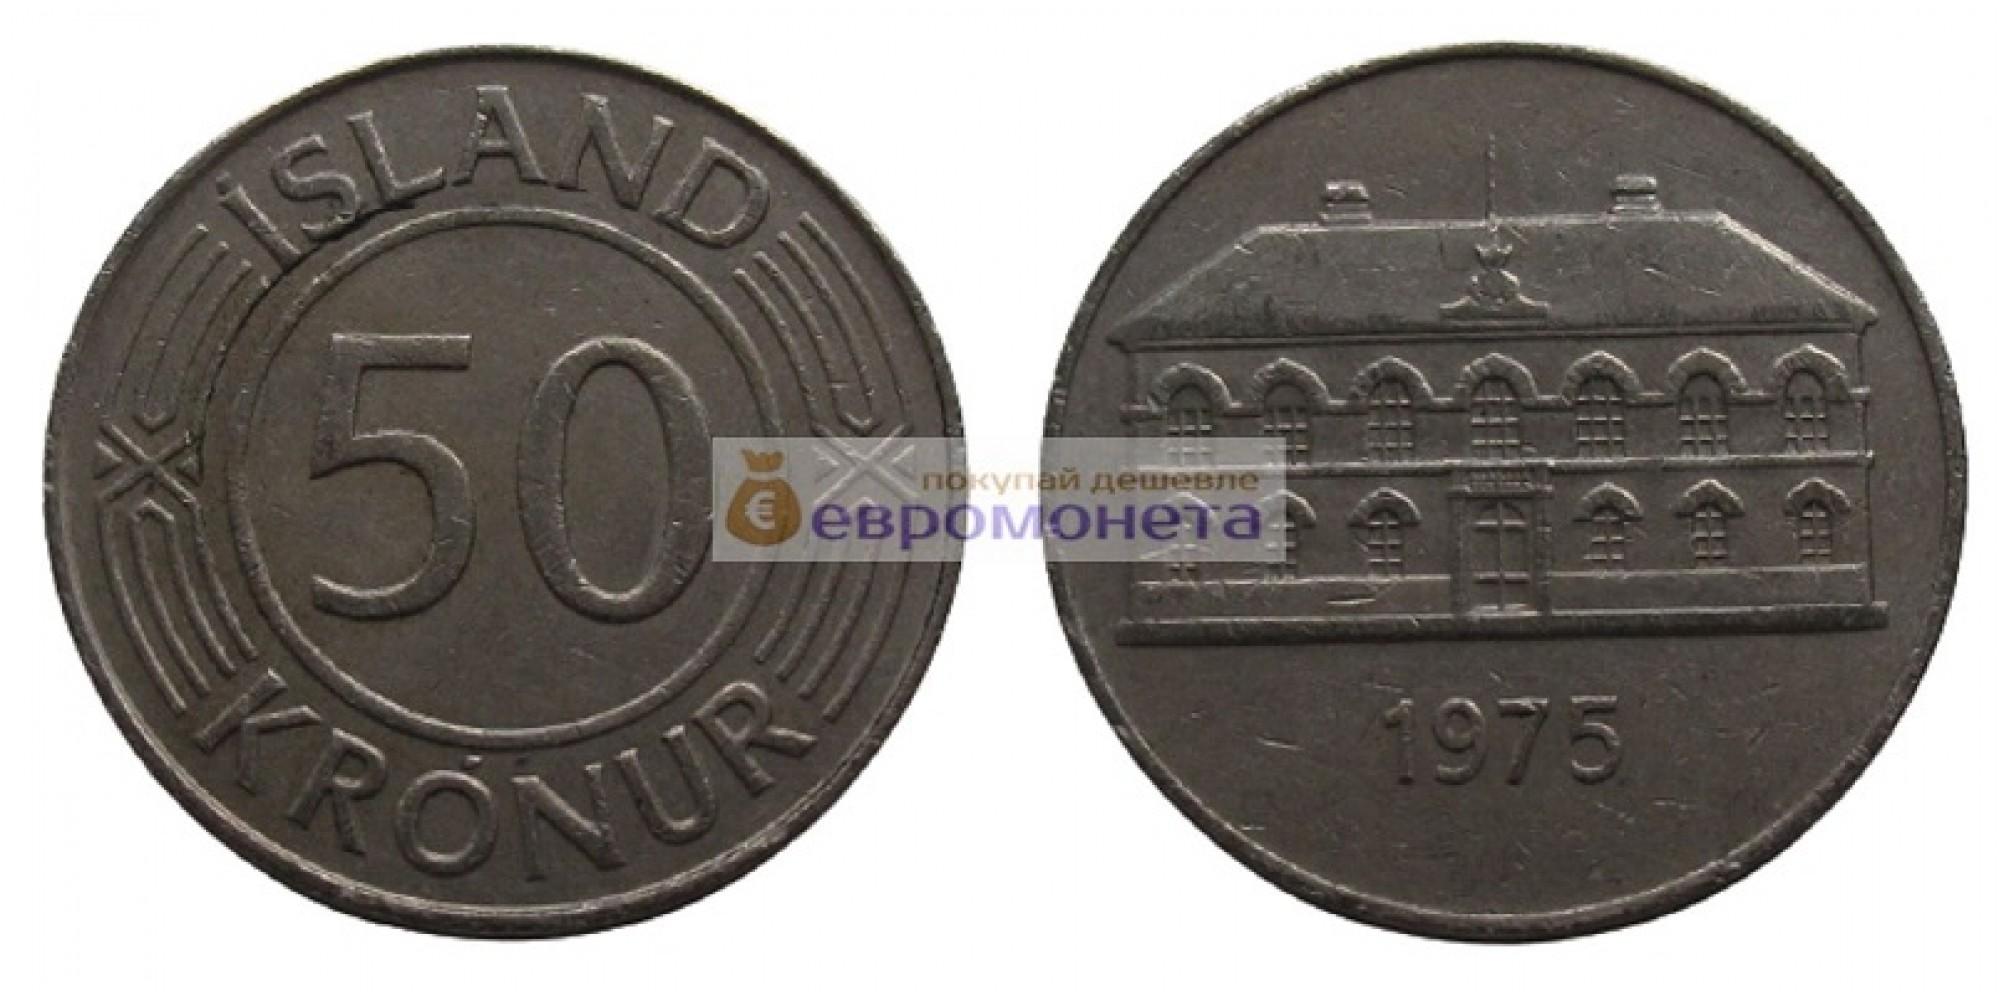 Республика Исландия 50 крон 1975 год